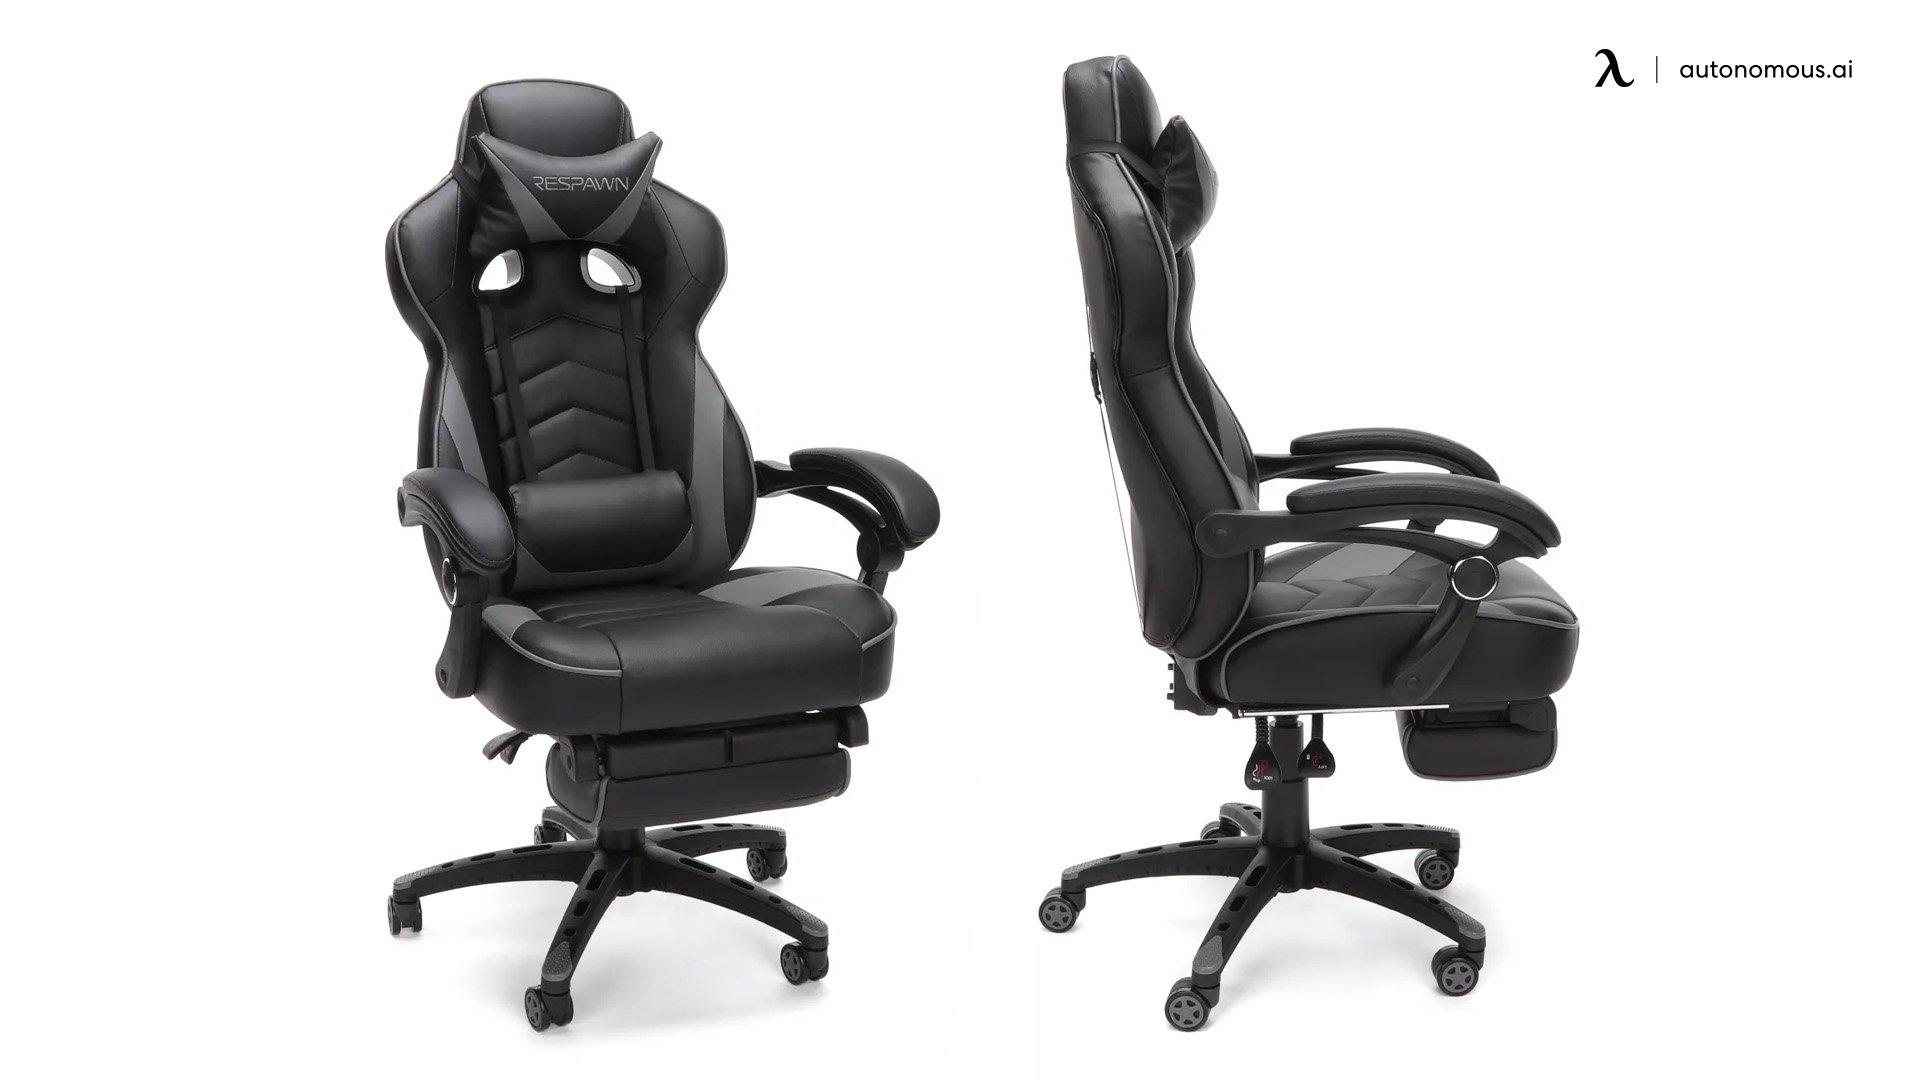 Respawn Reclining Office Chair